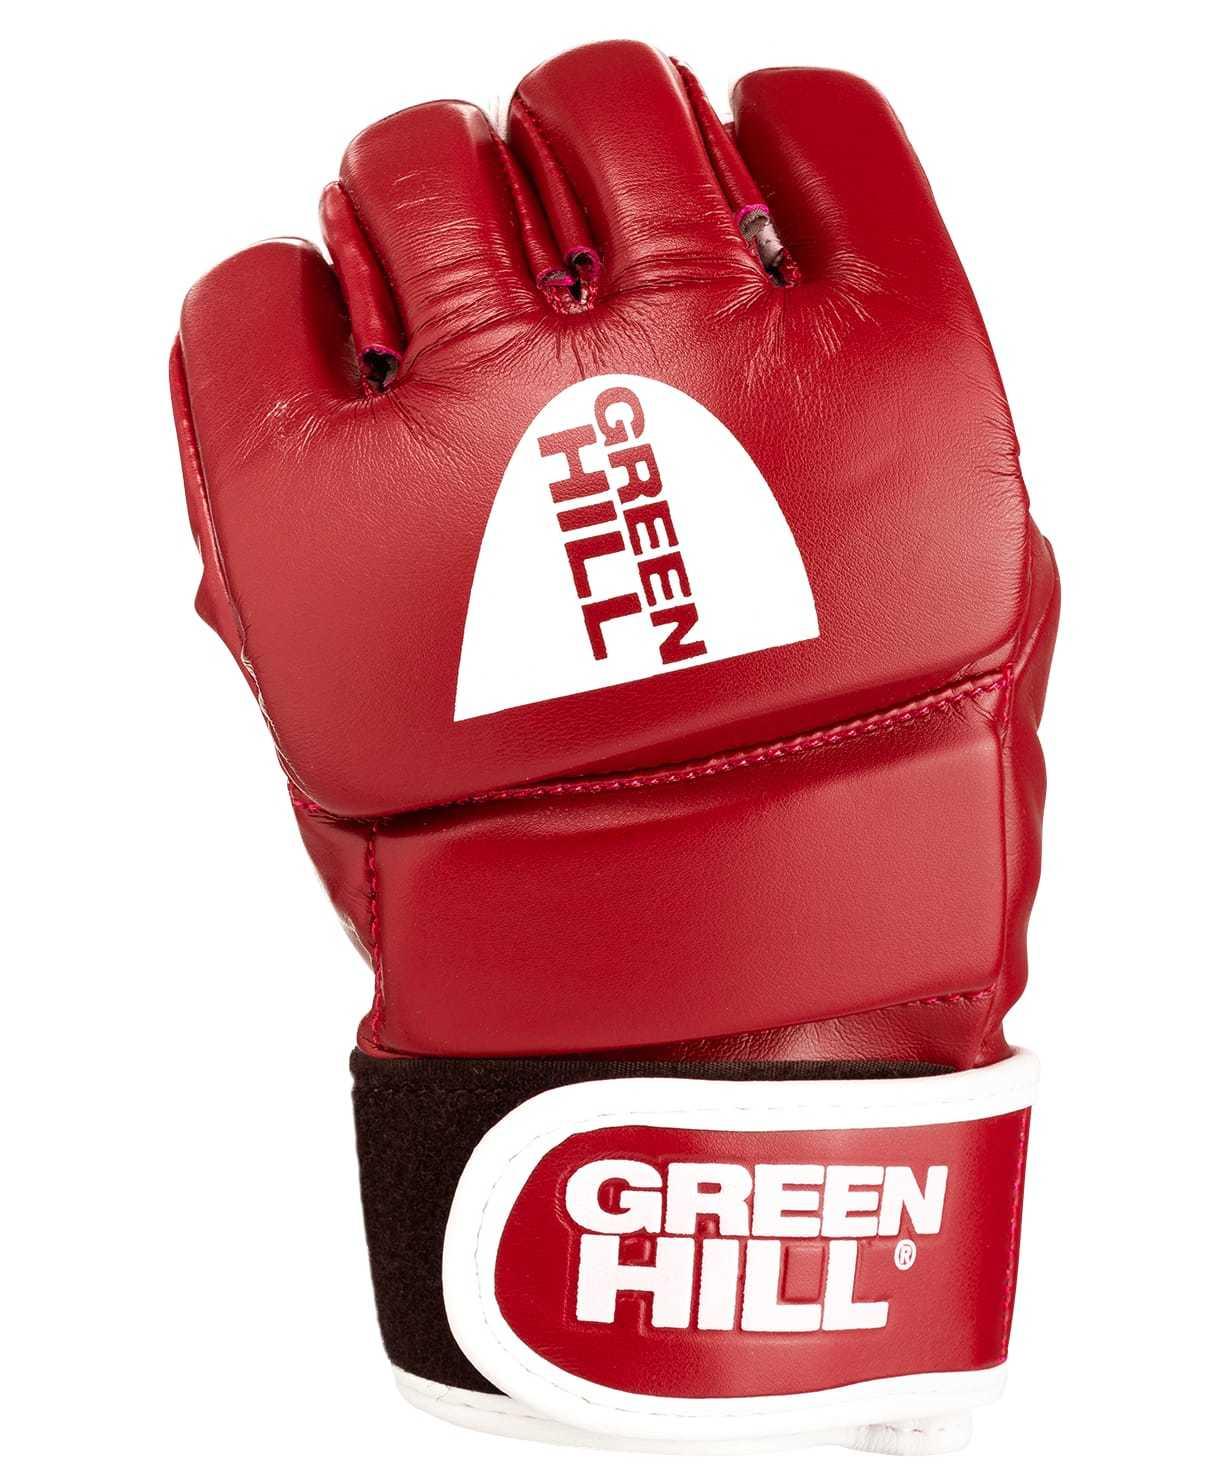 ММА перчатки Перчатки для MMA Combat Sambo Green Hill 193bc55f09e11f9eedc188f3e6d4faa3.jpg